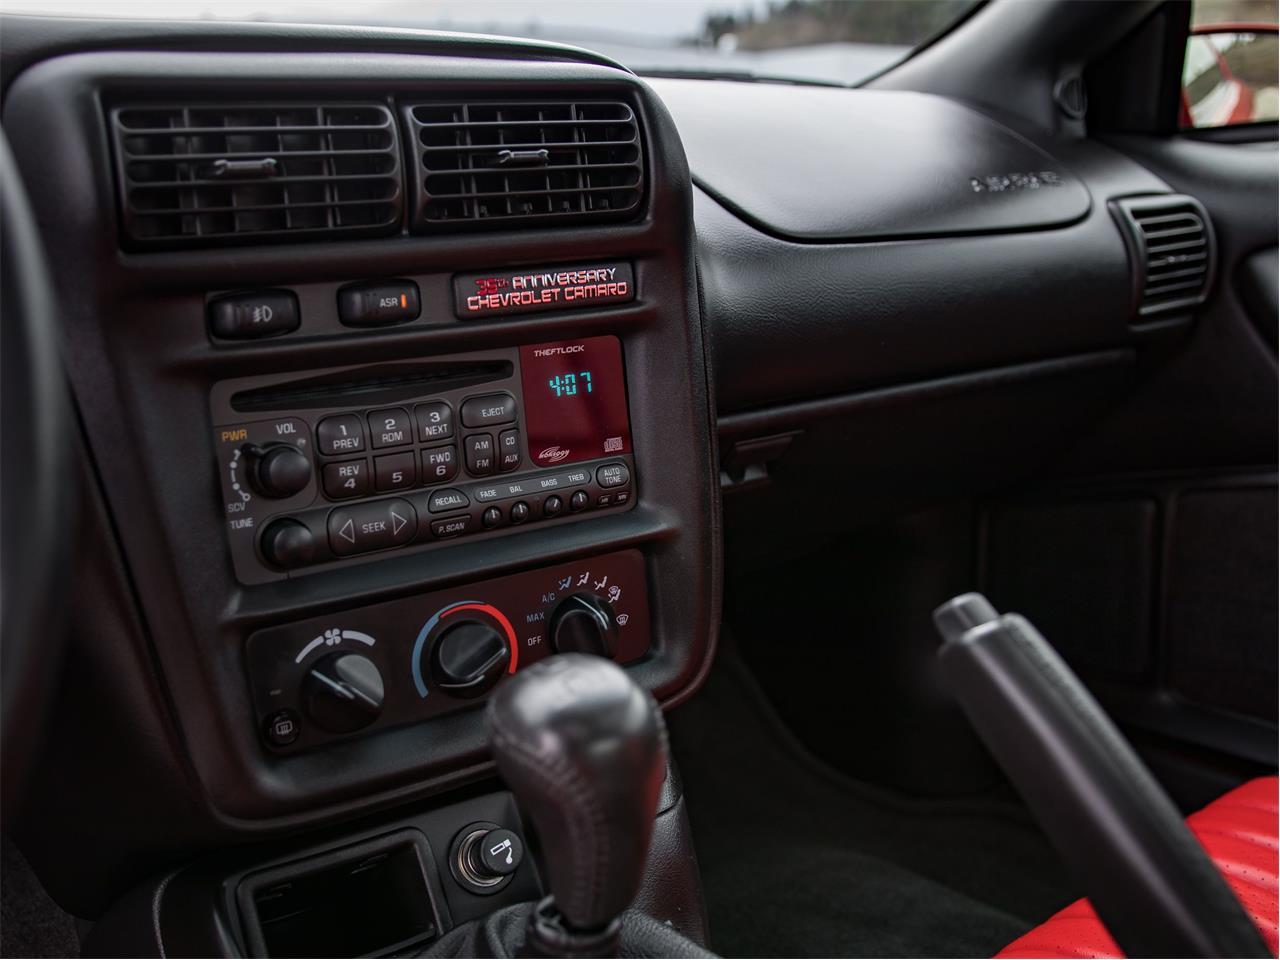 2002 Chevrolet Camaro (CC-1337831) for sale in Kelowna, British Columbia